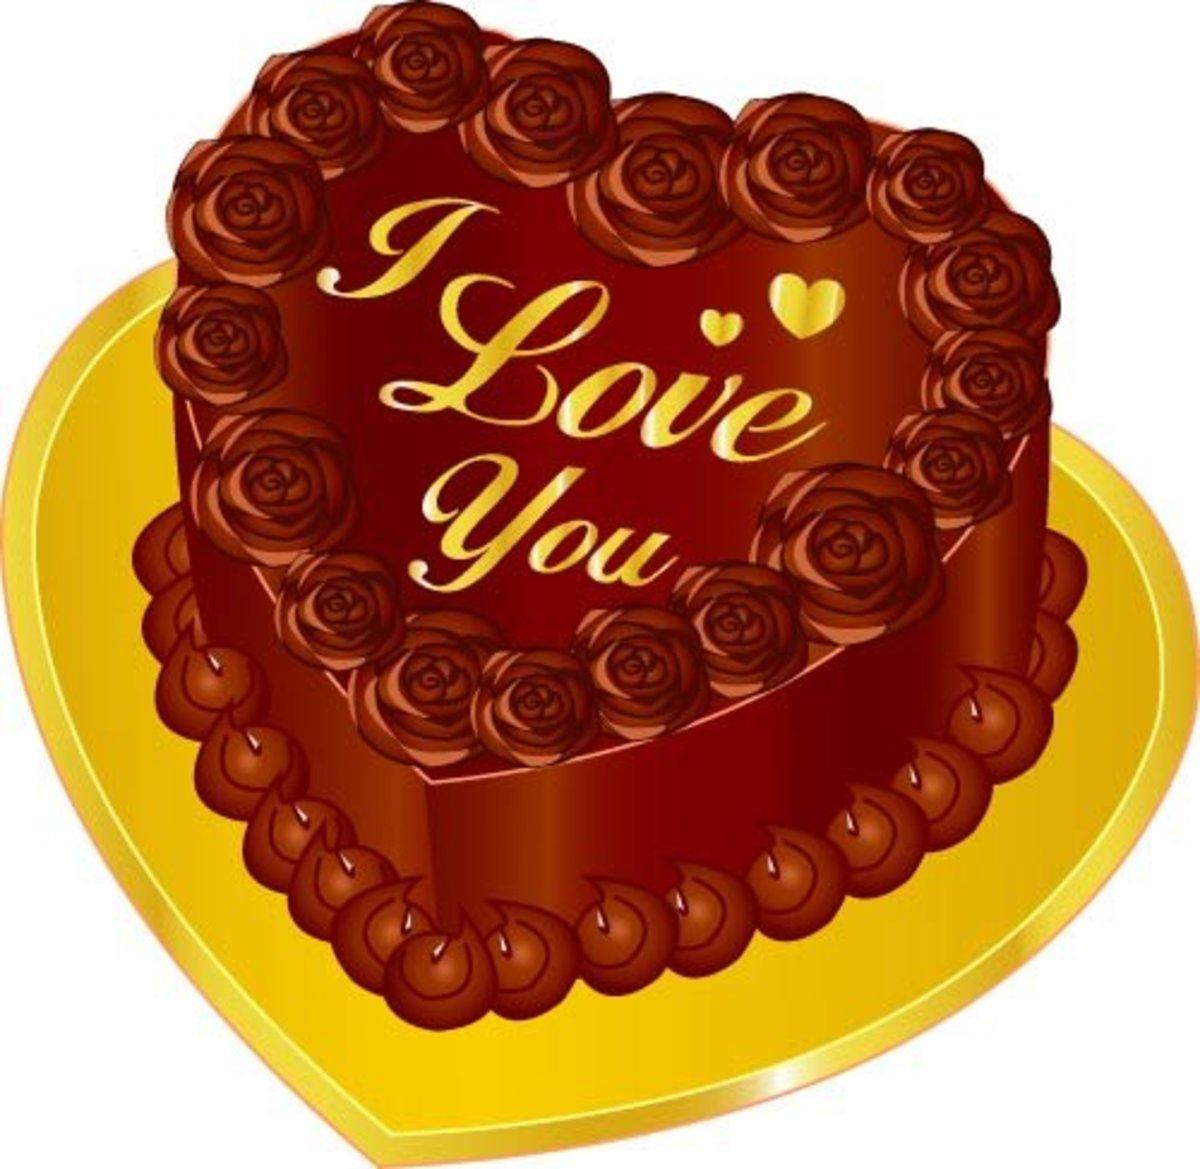 I Love You Heart Cake Photo